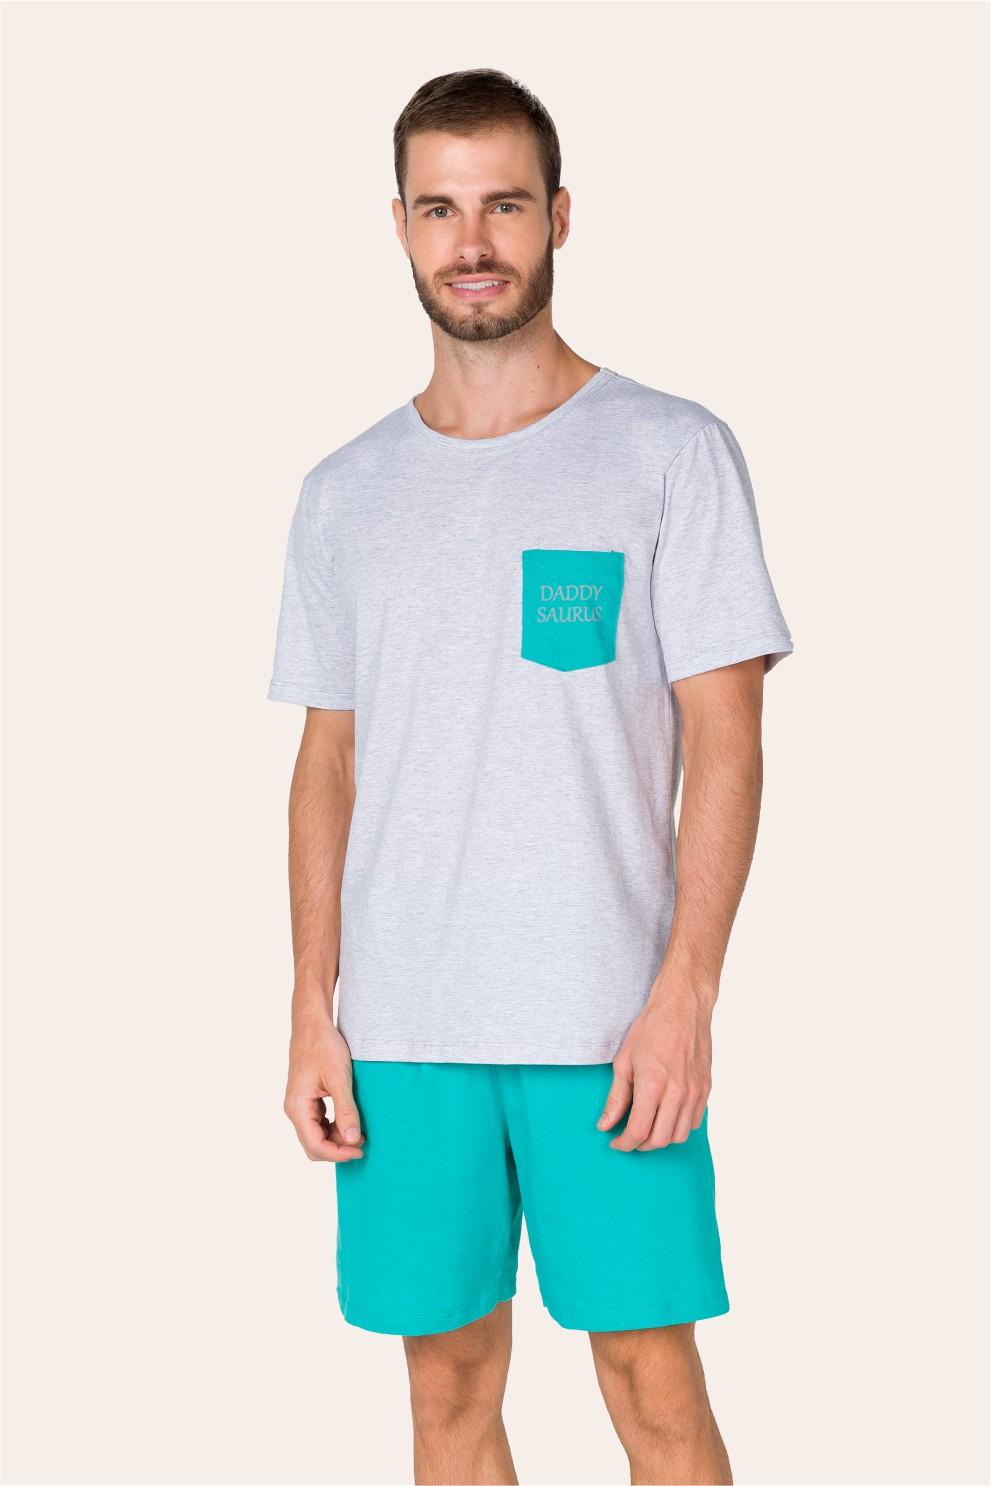 017/D - Pijama Adulto Masculino Daddysaurus - Família